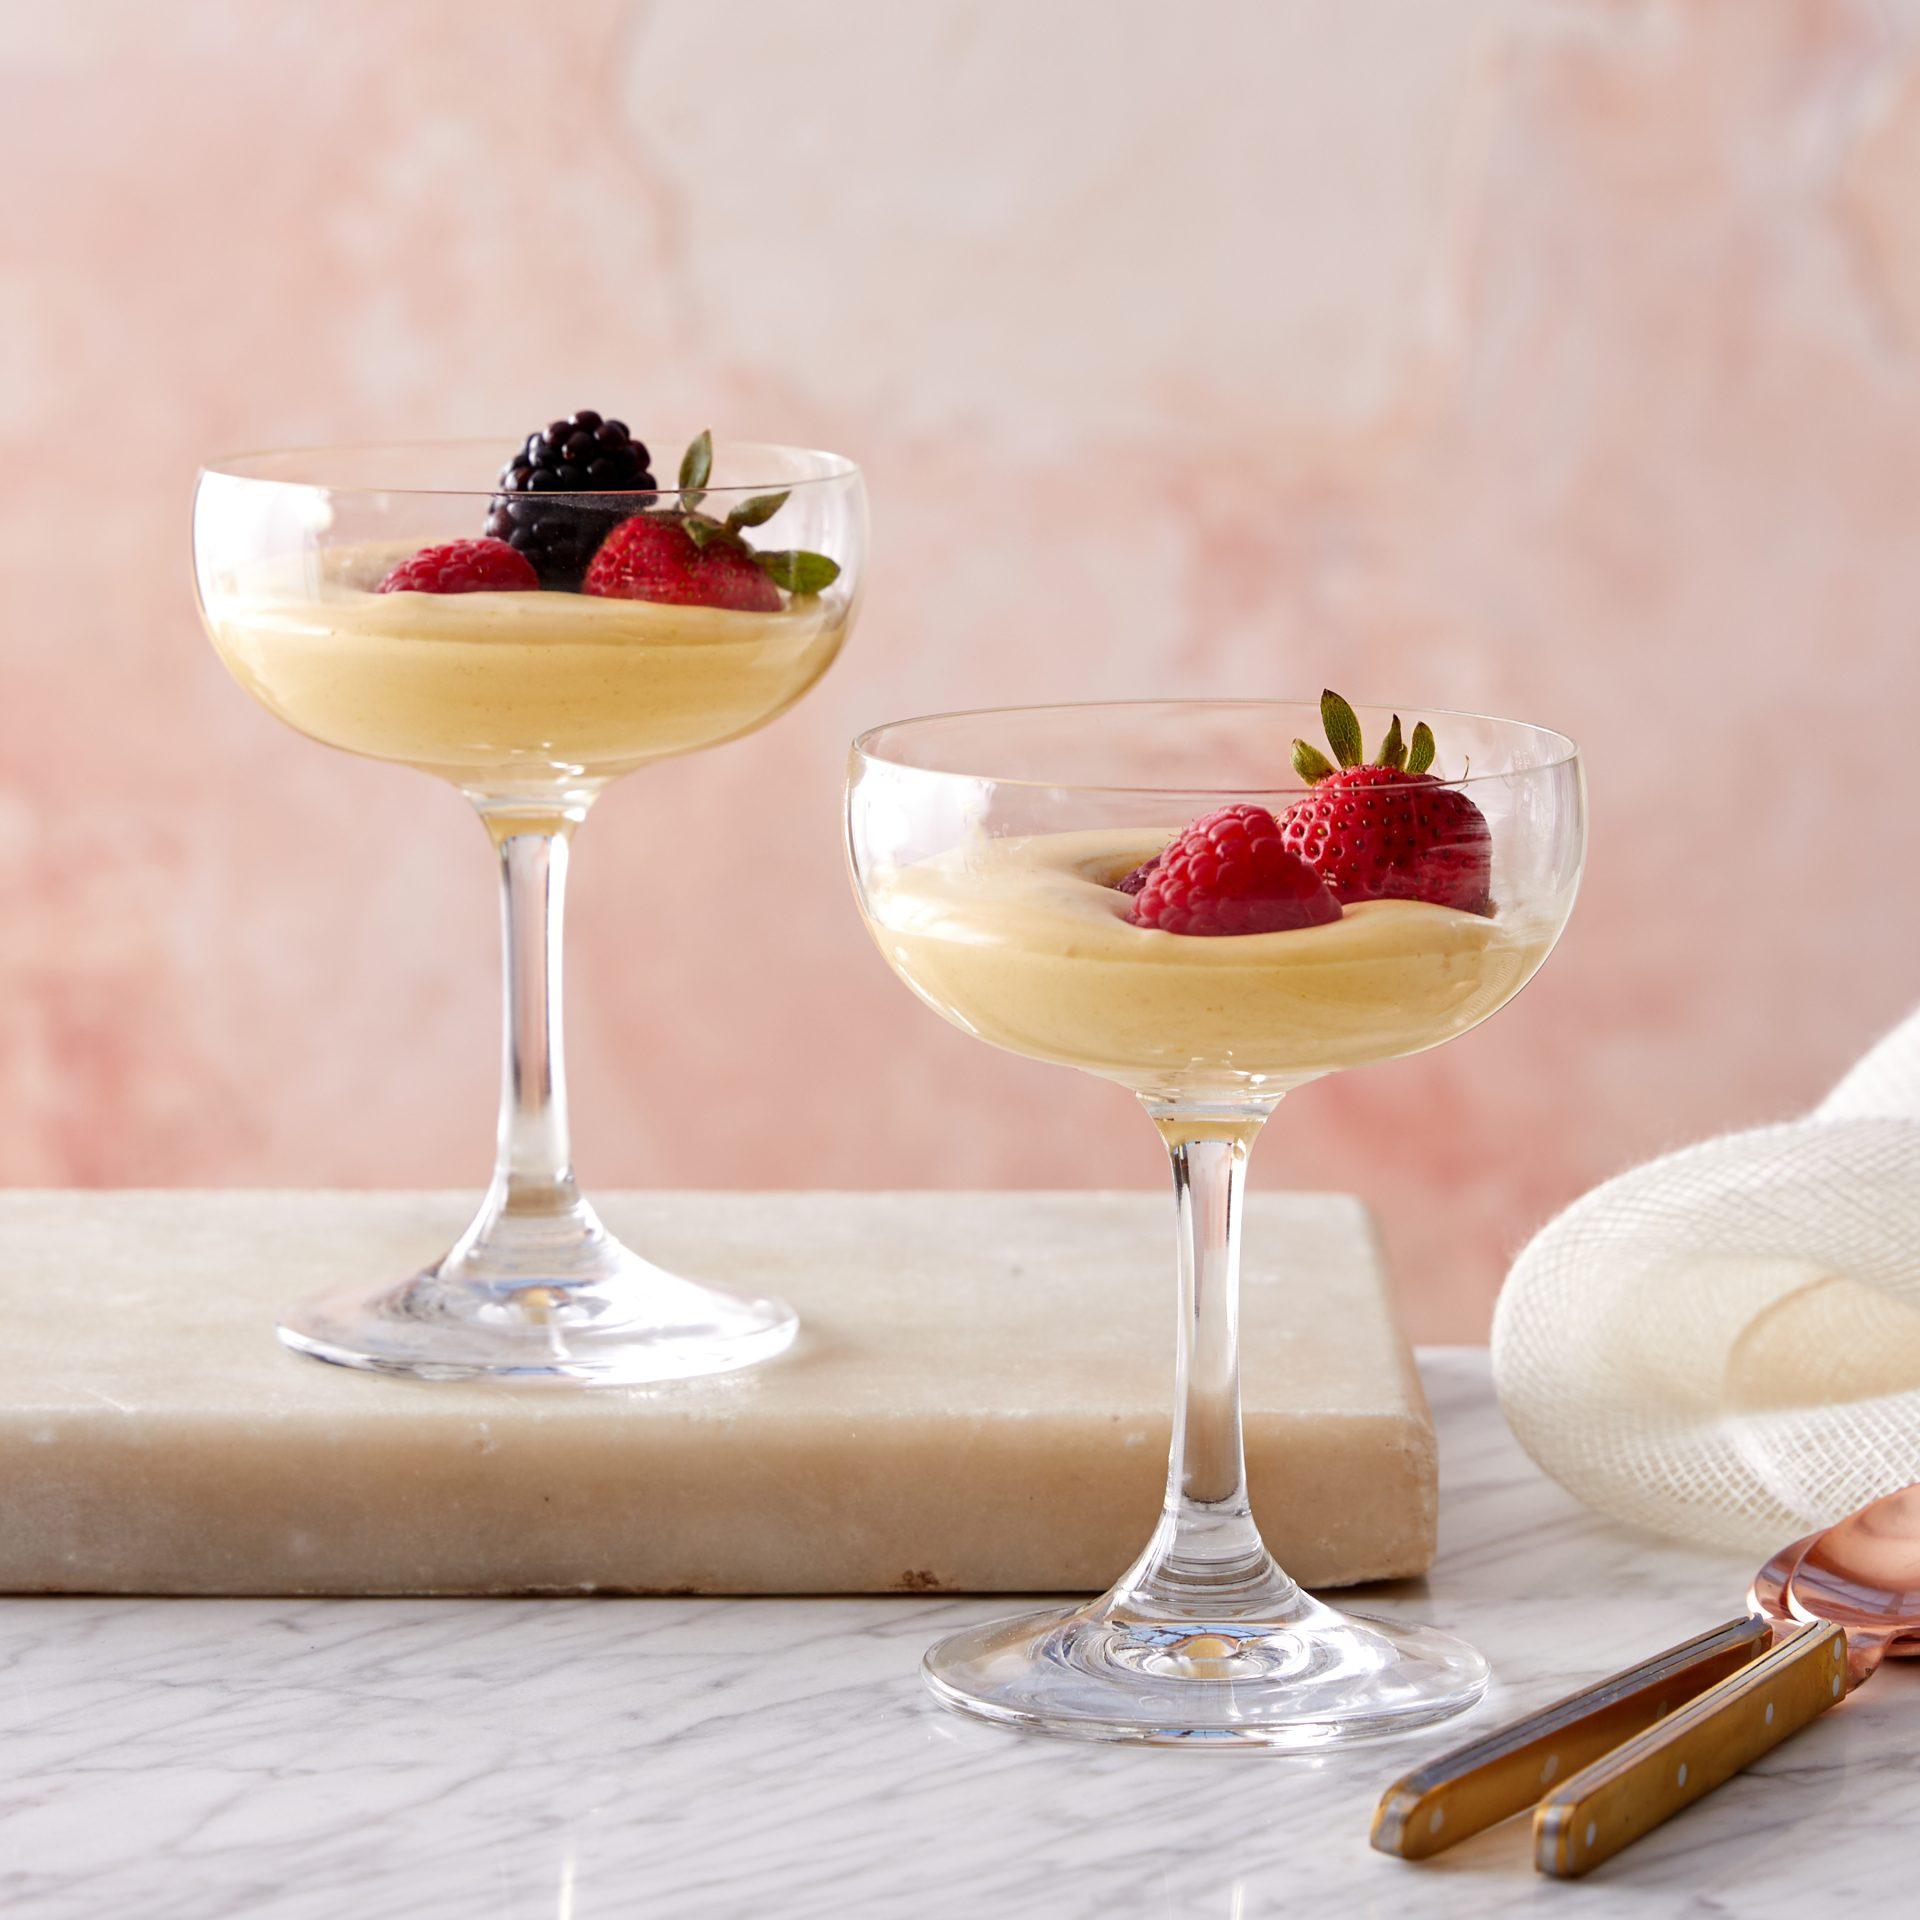 Zabiglione dessert christian petroni 38701 1